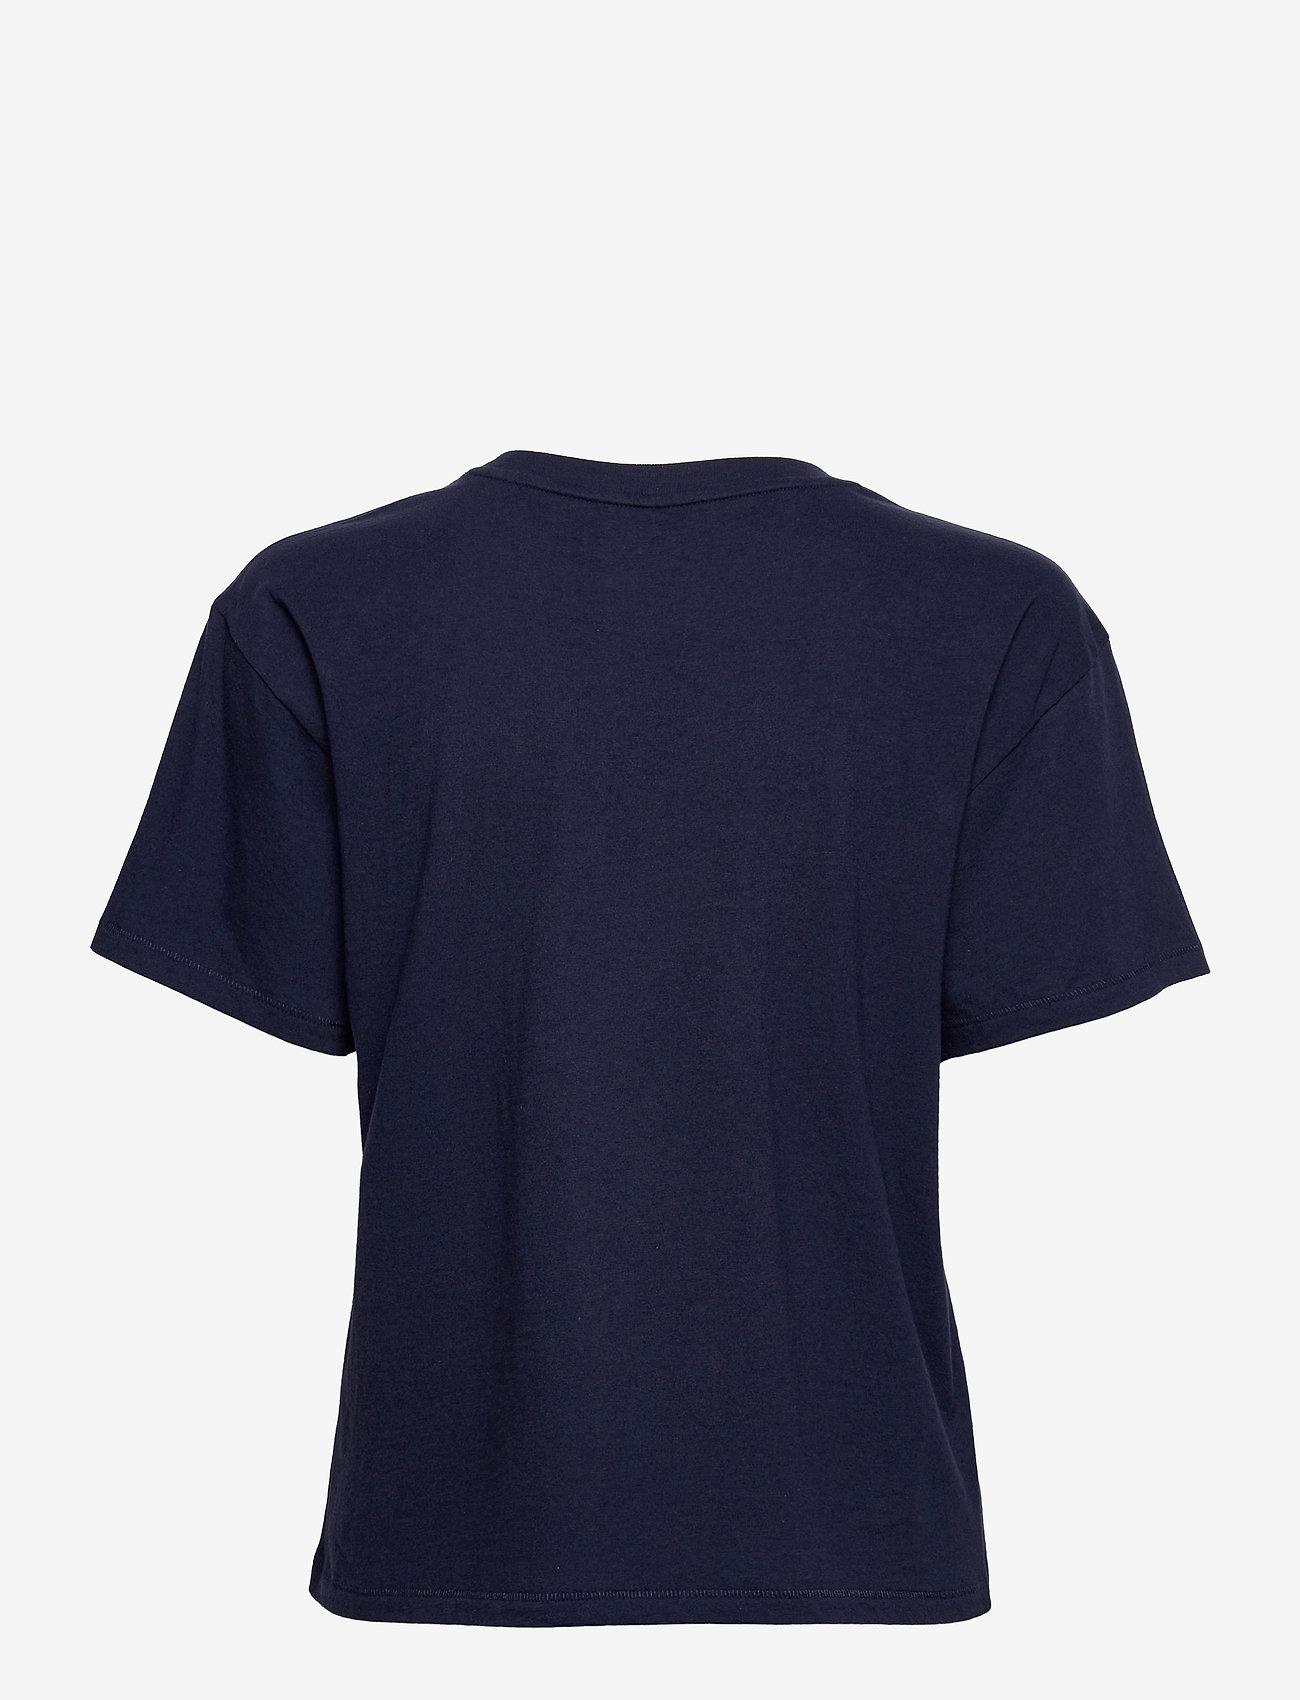 GAP - GAP EASY SS TEE - NYC - t-shirts - navy uniform - 1